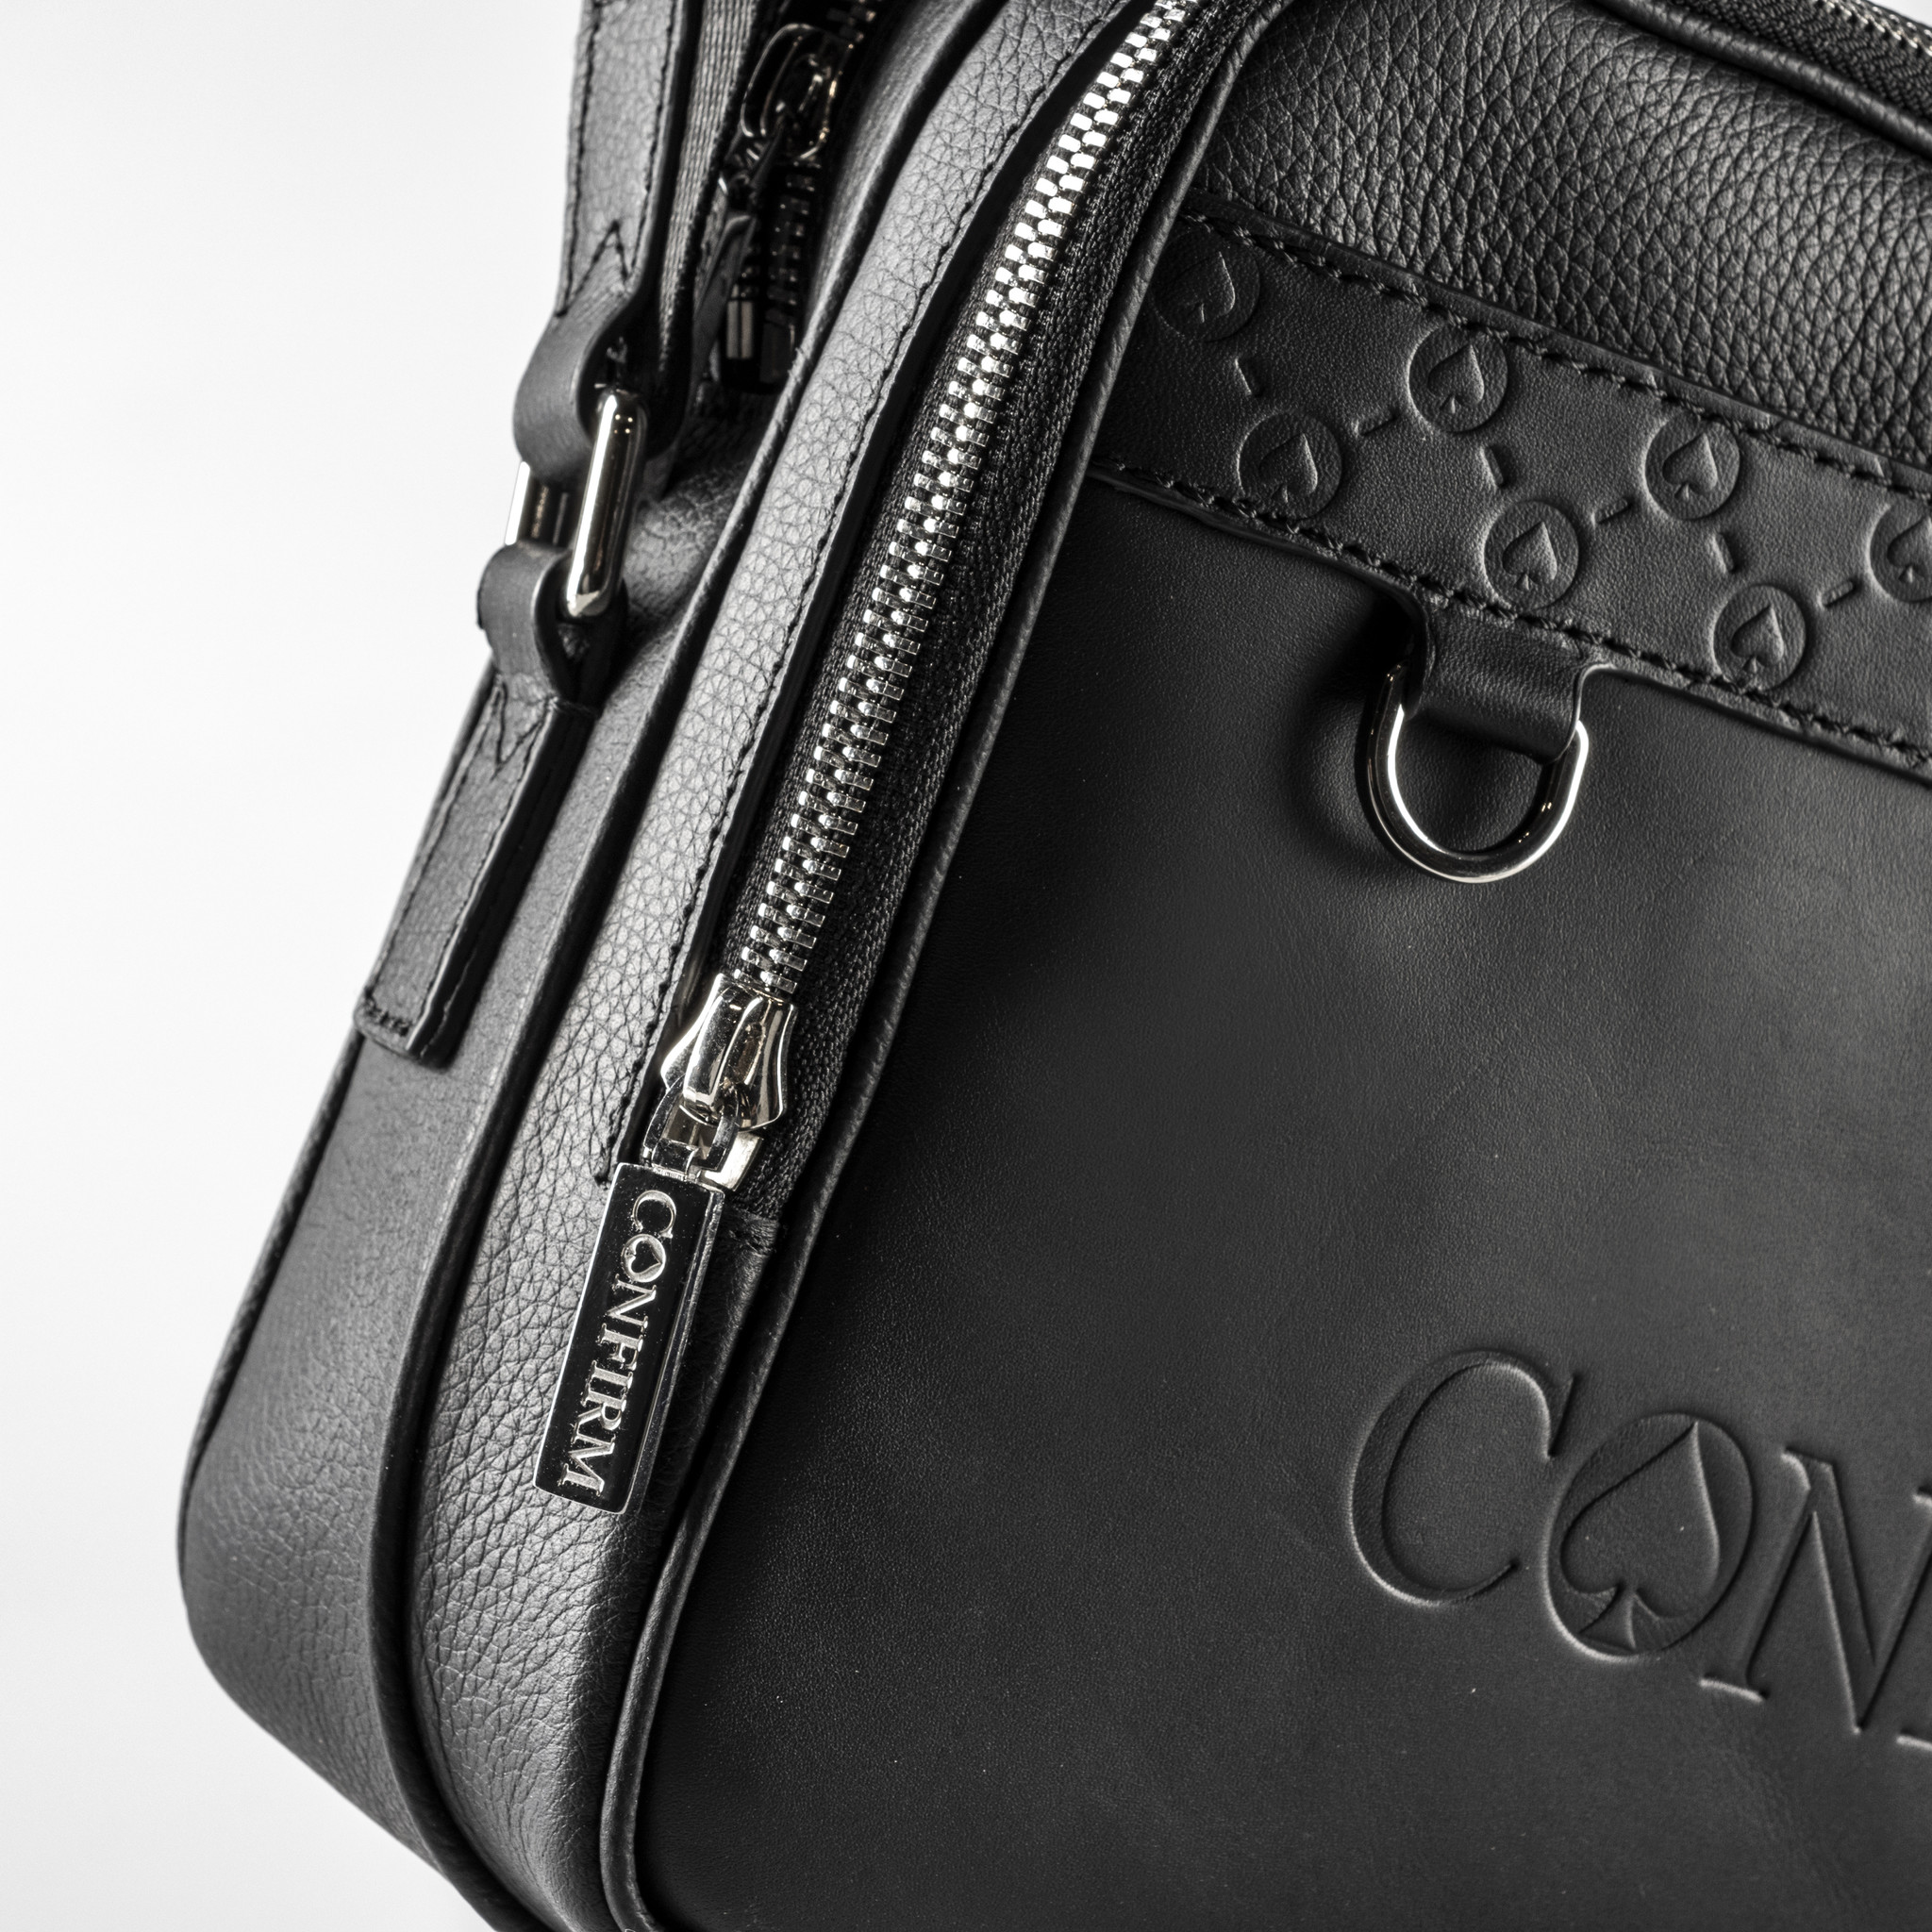 Confirm messenger bag Humero - smooth-5